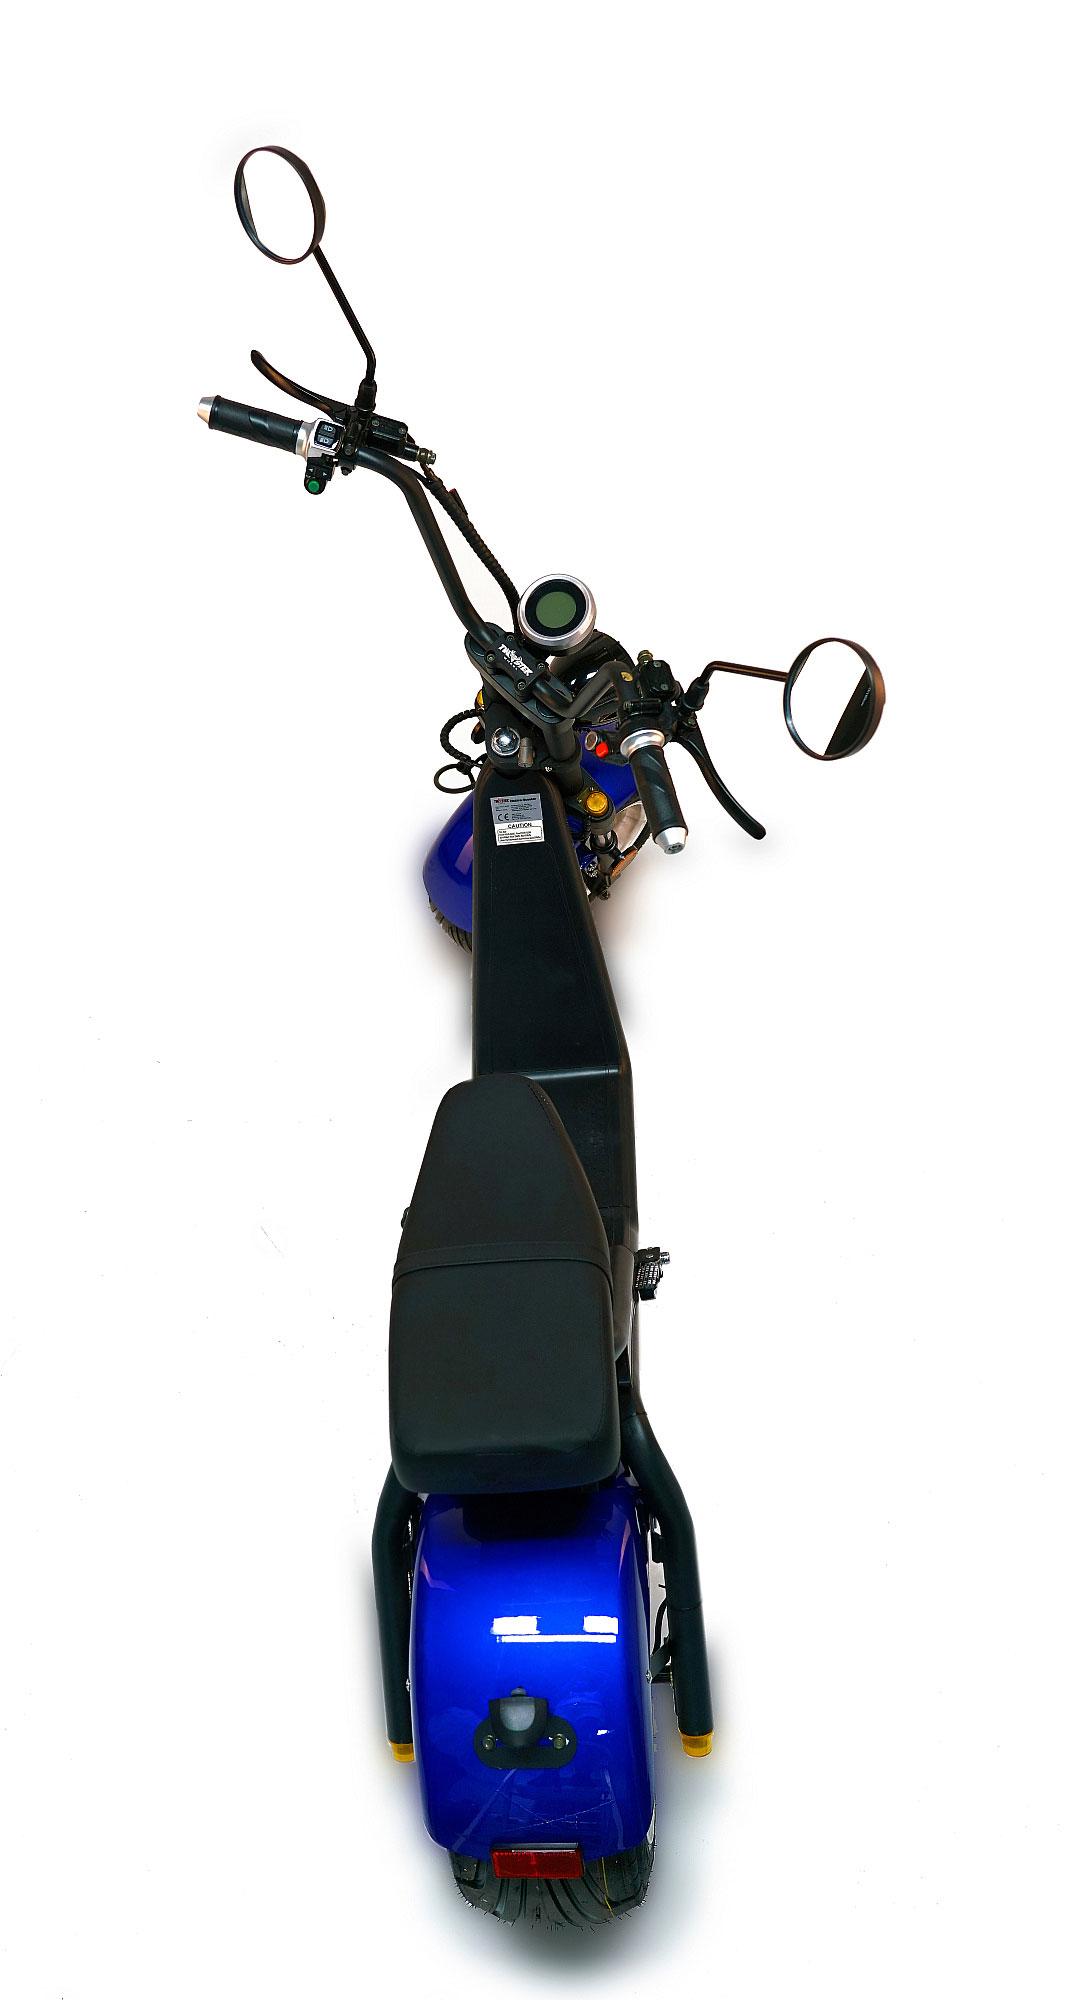 Elektro-Roller, 1200L, E Cruiser, Elektro Scooter, City Chopper sw/bl Bild 2